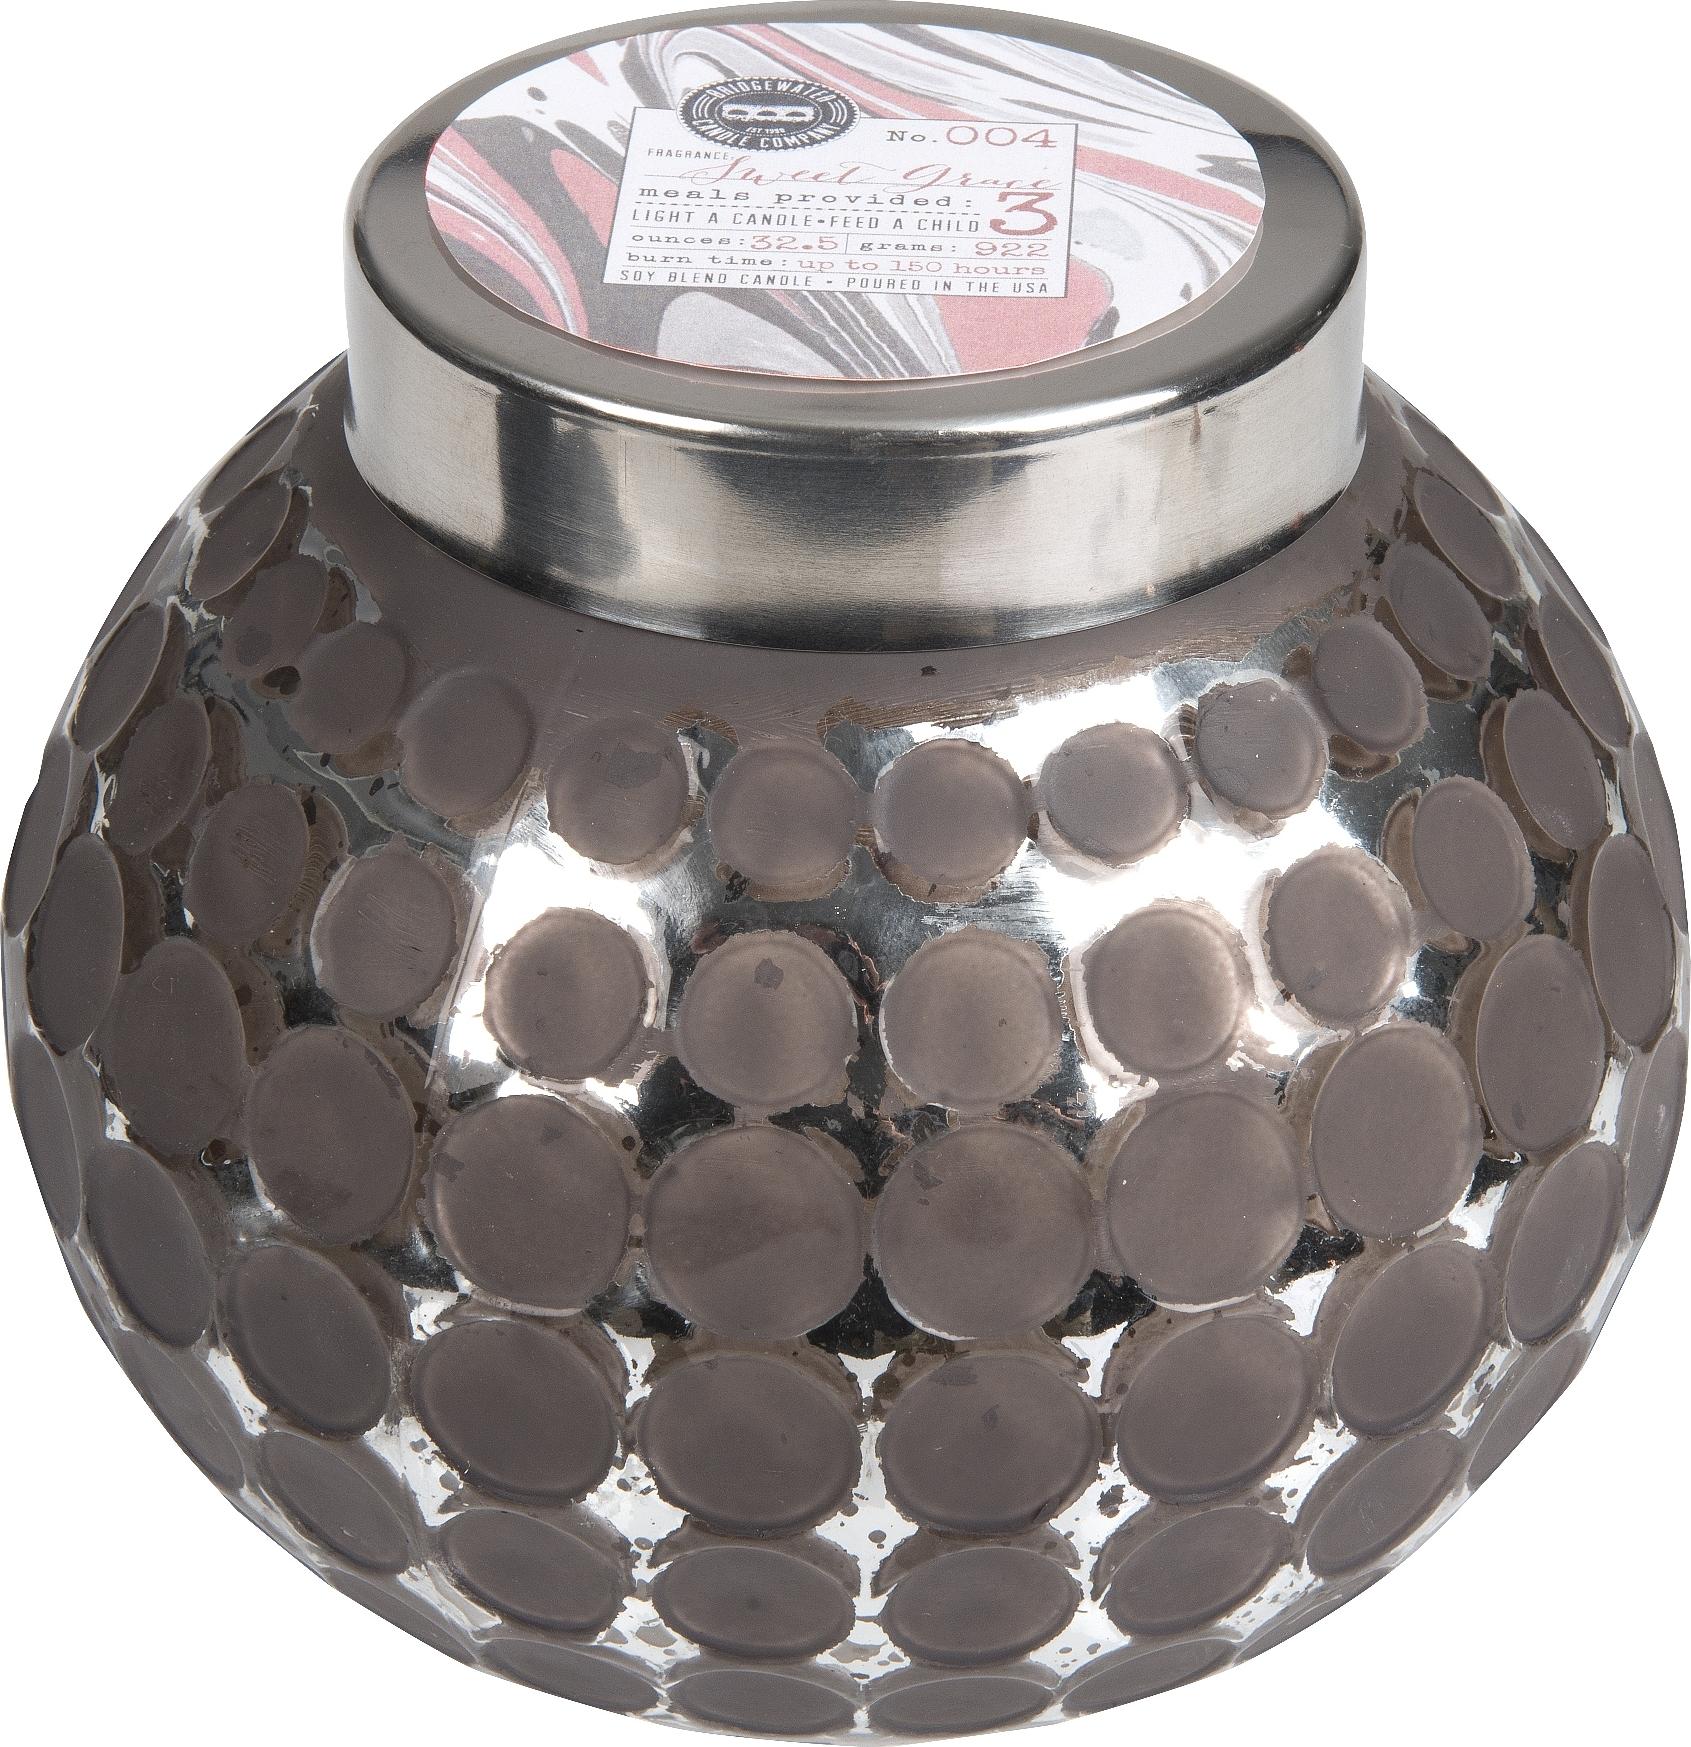 Bridgewater Candle Company Vonná svíčka SWEET GRACE | SG004 IDSG004